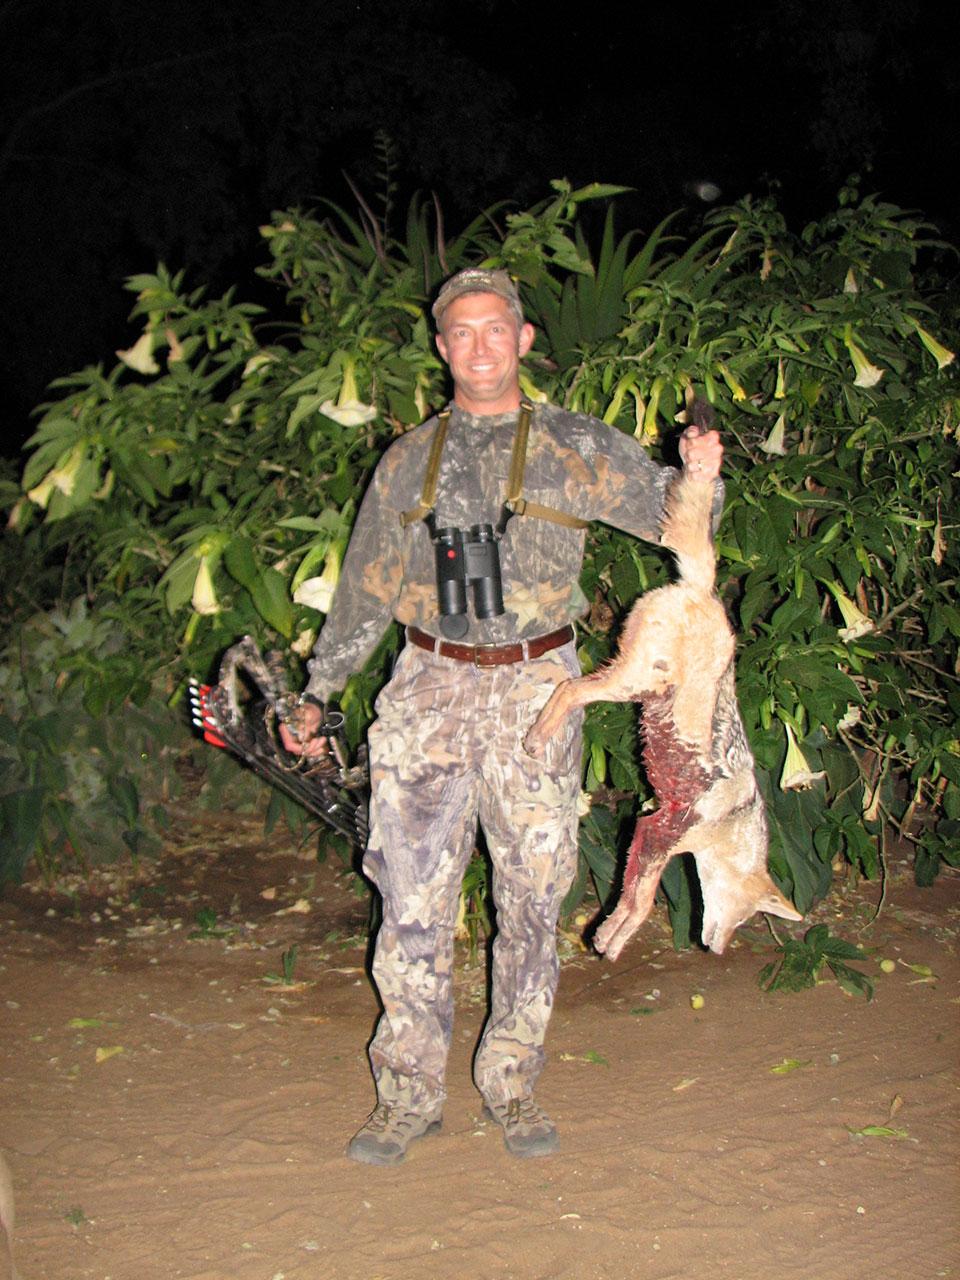 Archery-Hunt-for-Jackal-in-Africa.jpg